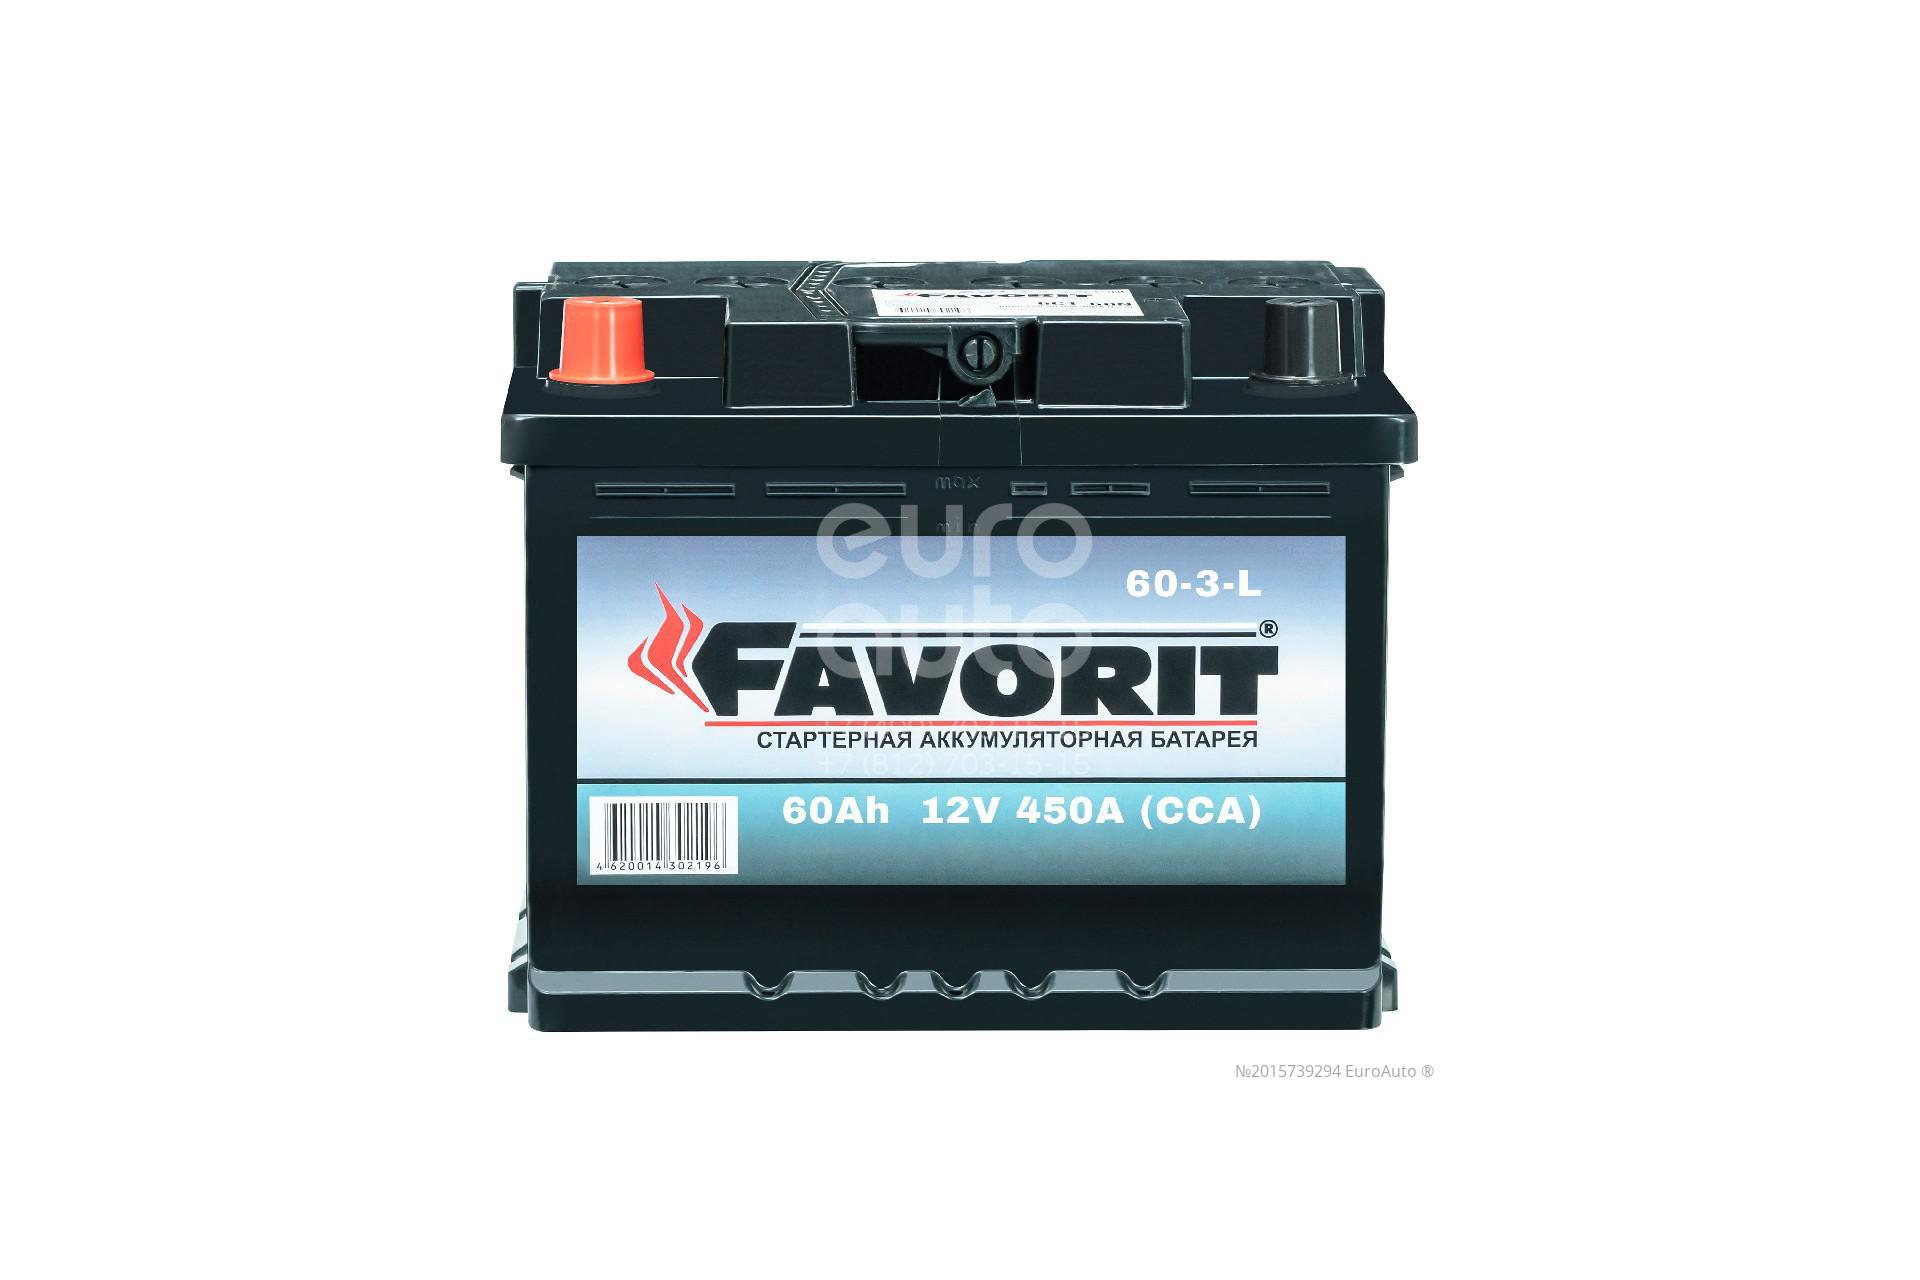 Аккумулятор +/- 242-175-190 АКБ FAVORIT 60 А*Ч 510А (60-3-L) - Фото №1